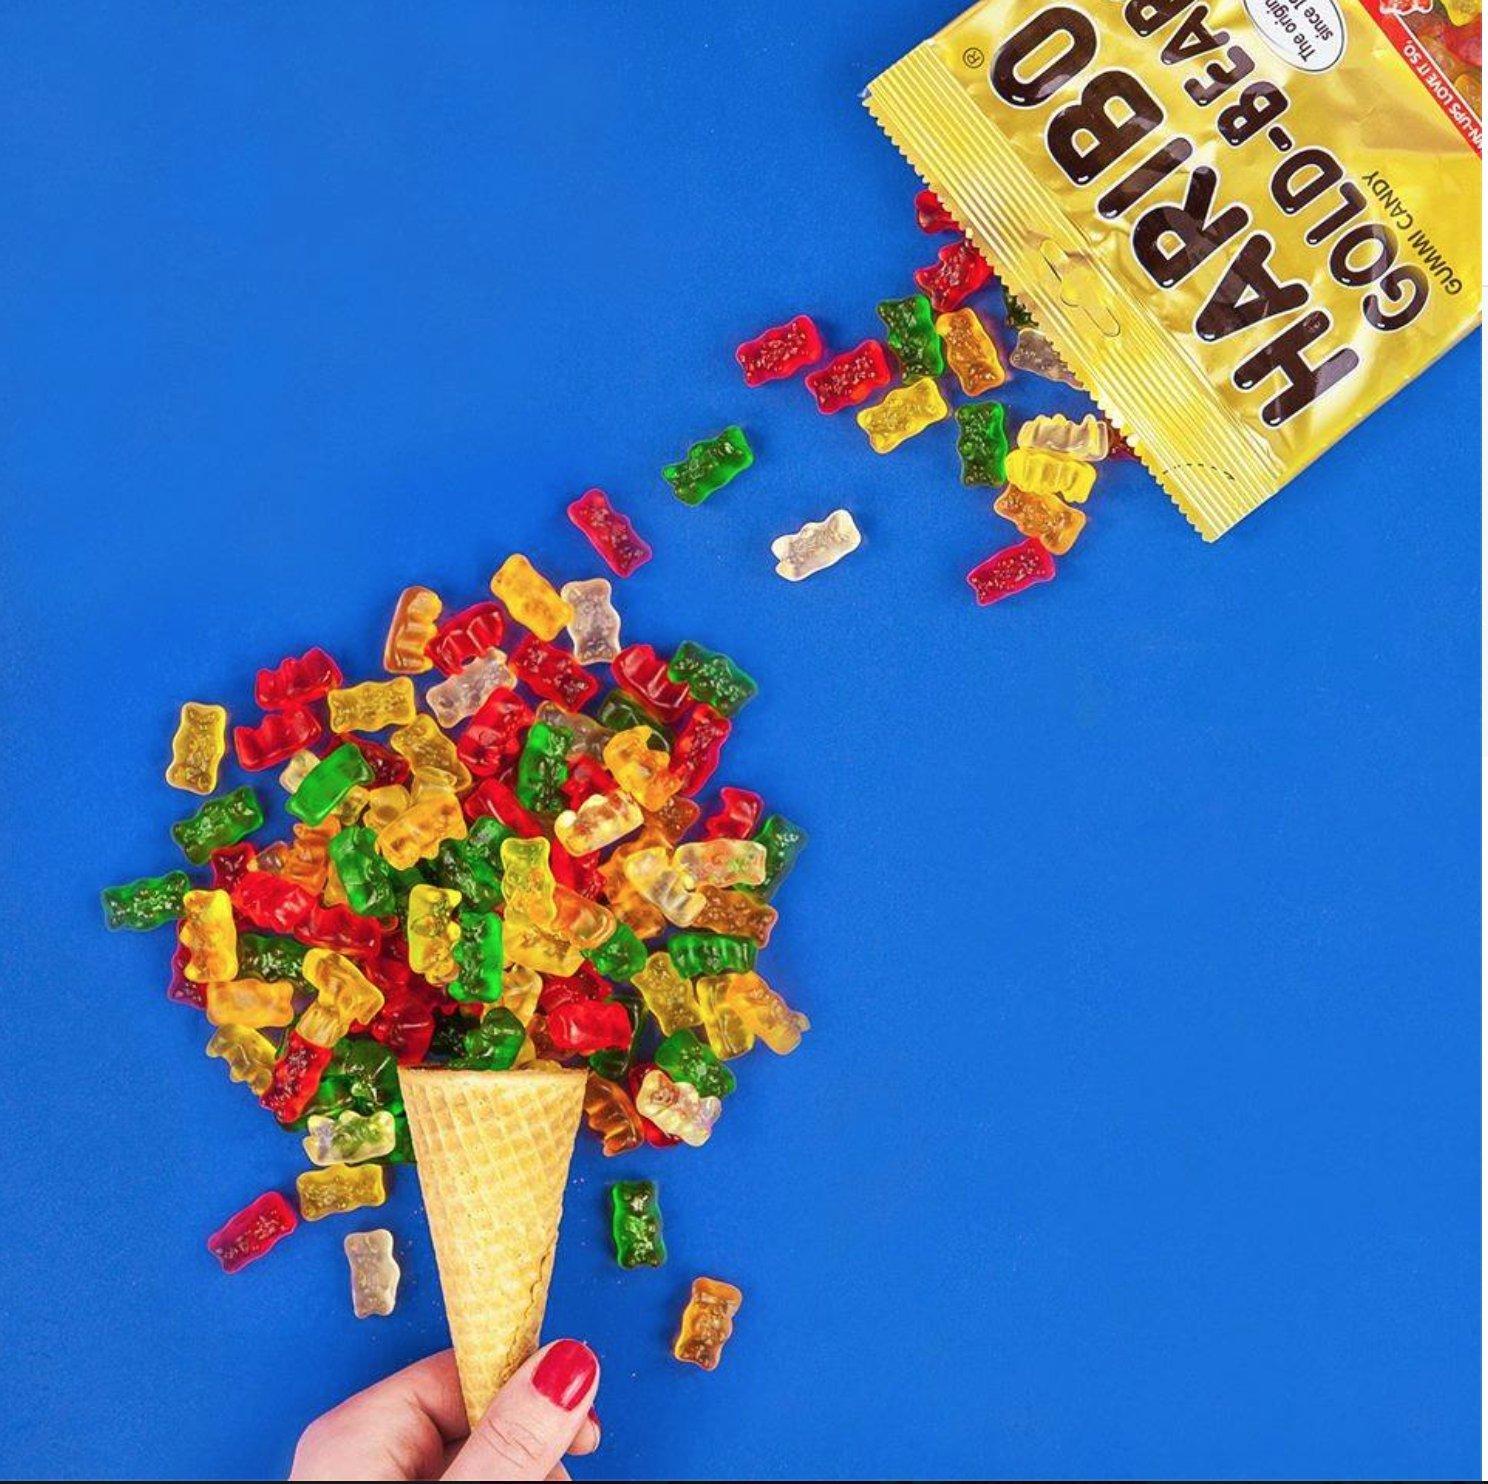 Haribo Gummi Candy, Goldbears Gummy Candy, 48 Ounce Bag (Pack of 4) by Haribo (Image #4)